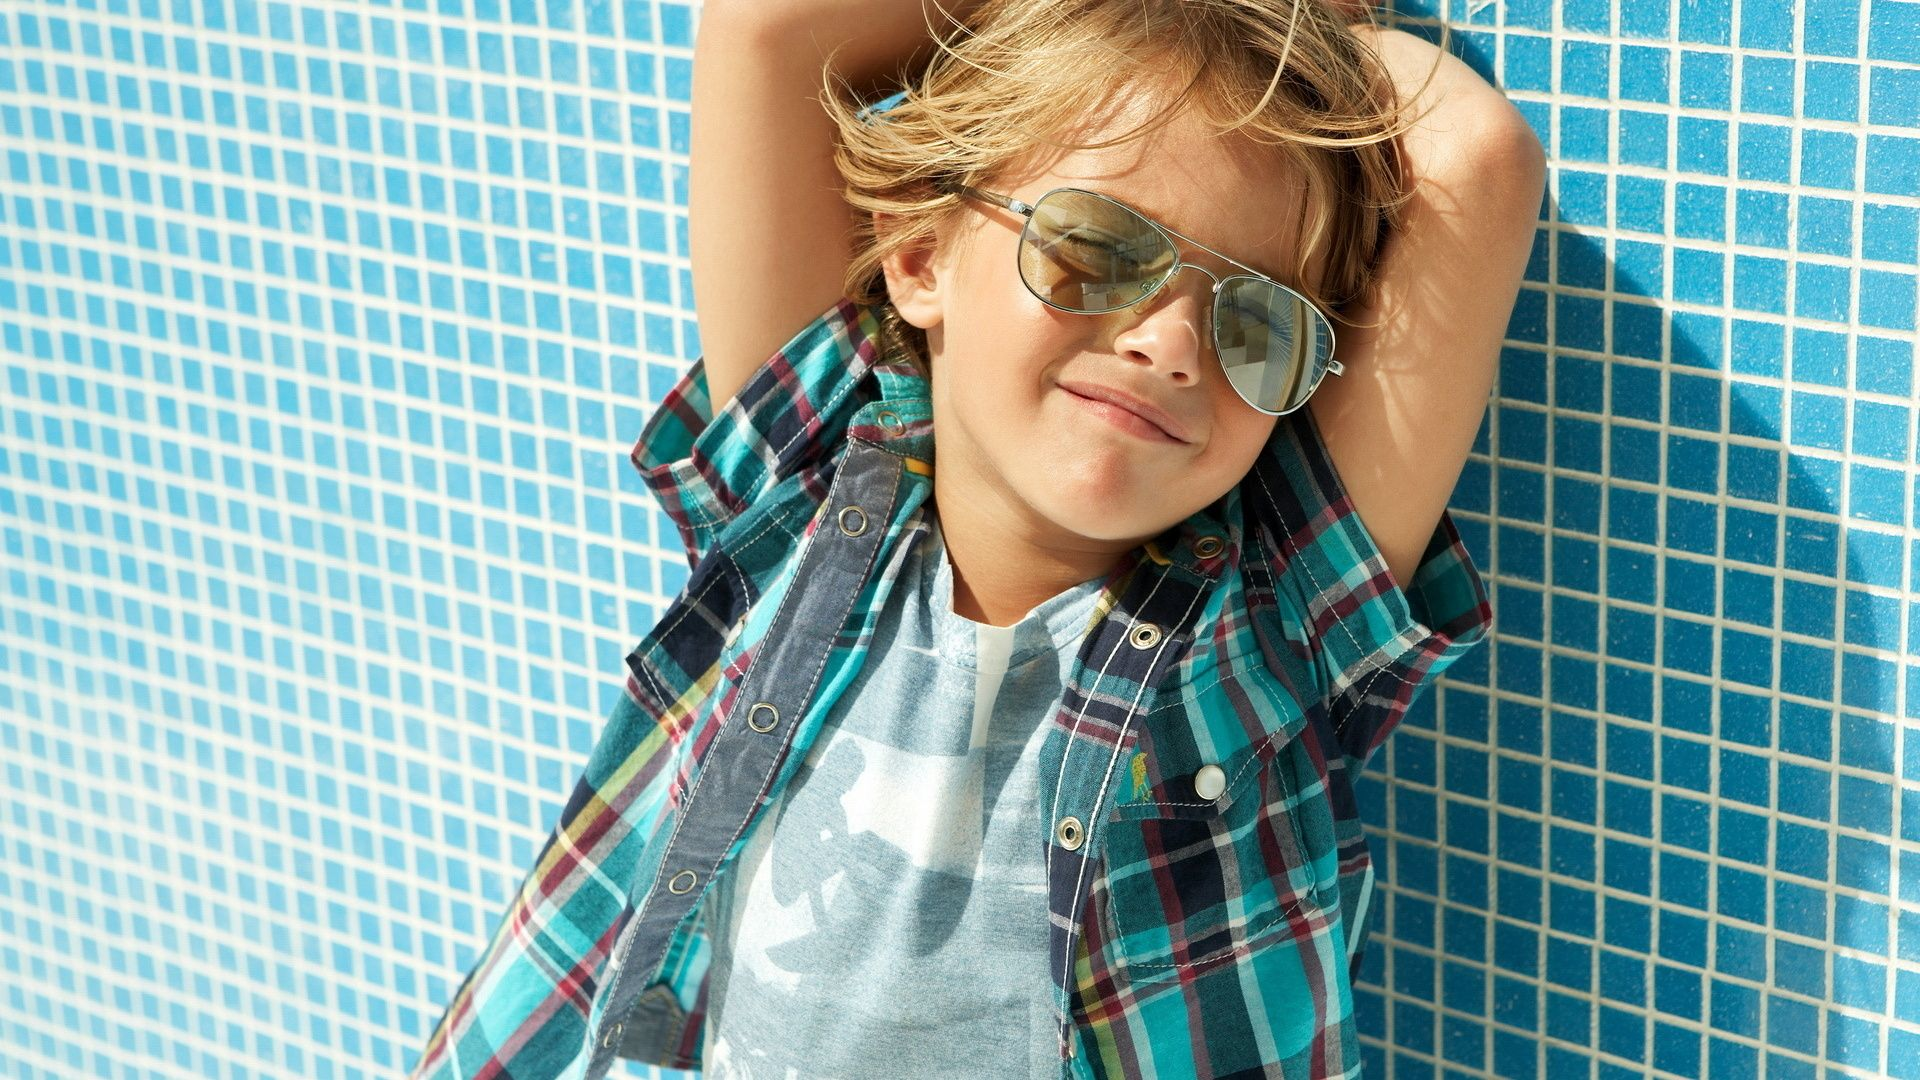 Kids Hd Wallpaper Kids Pinterest Little Boy Hairstyles Hair